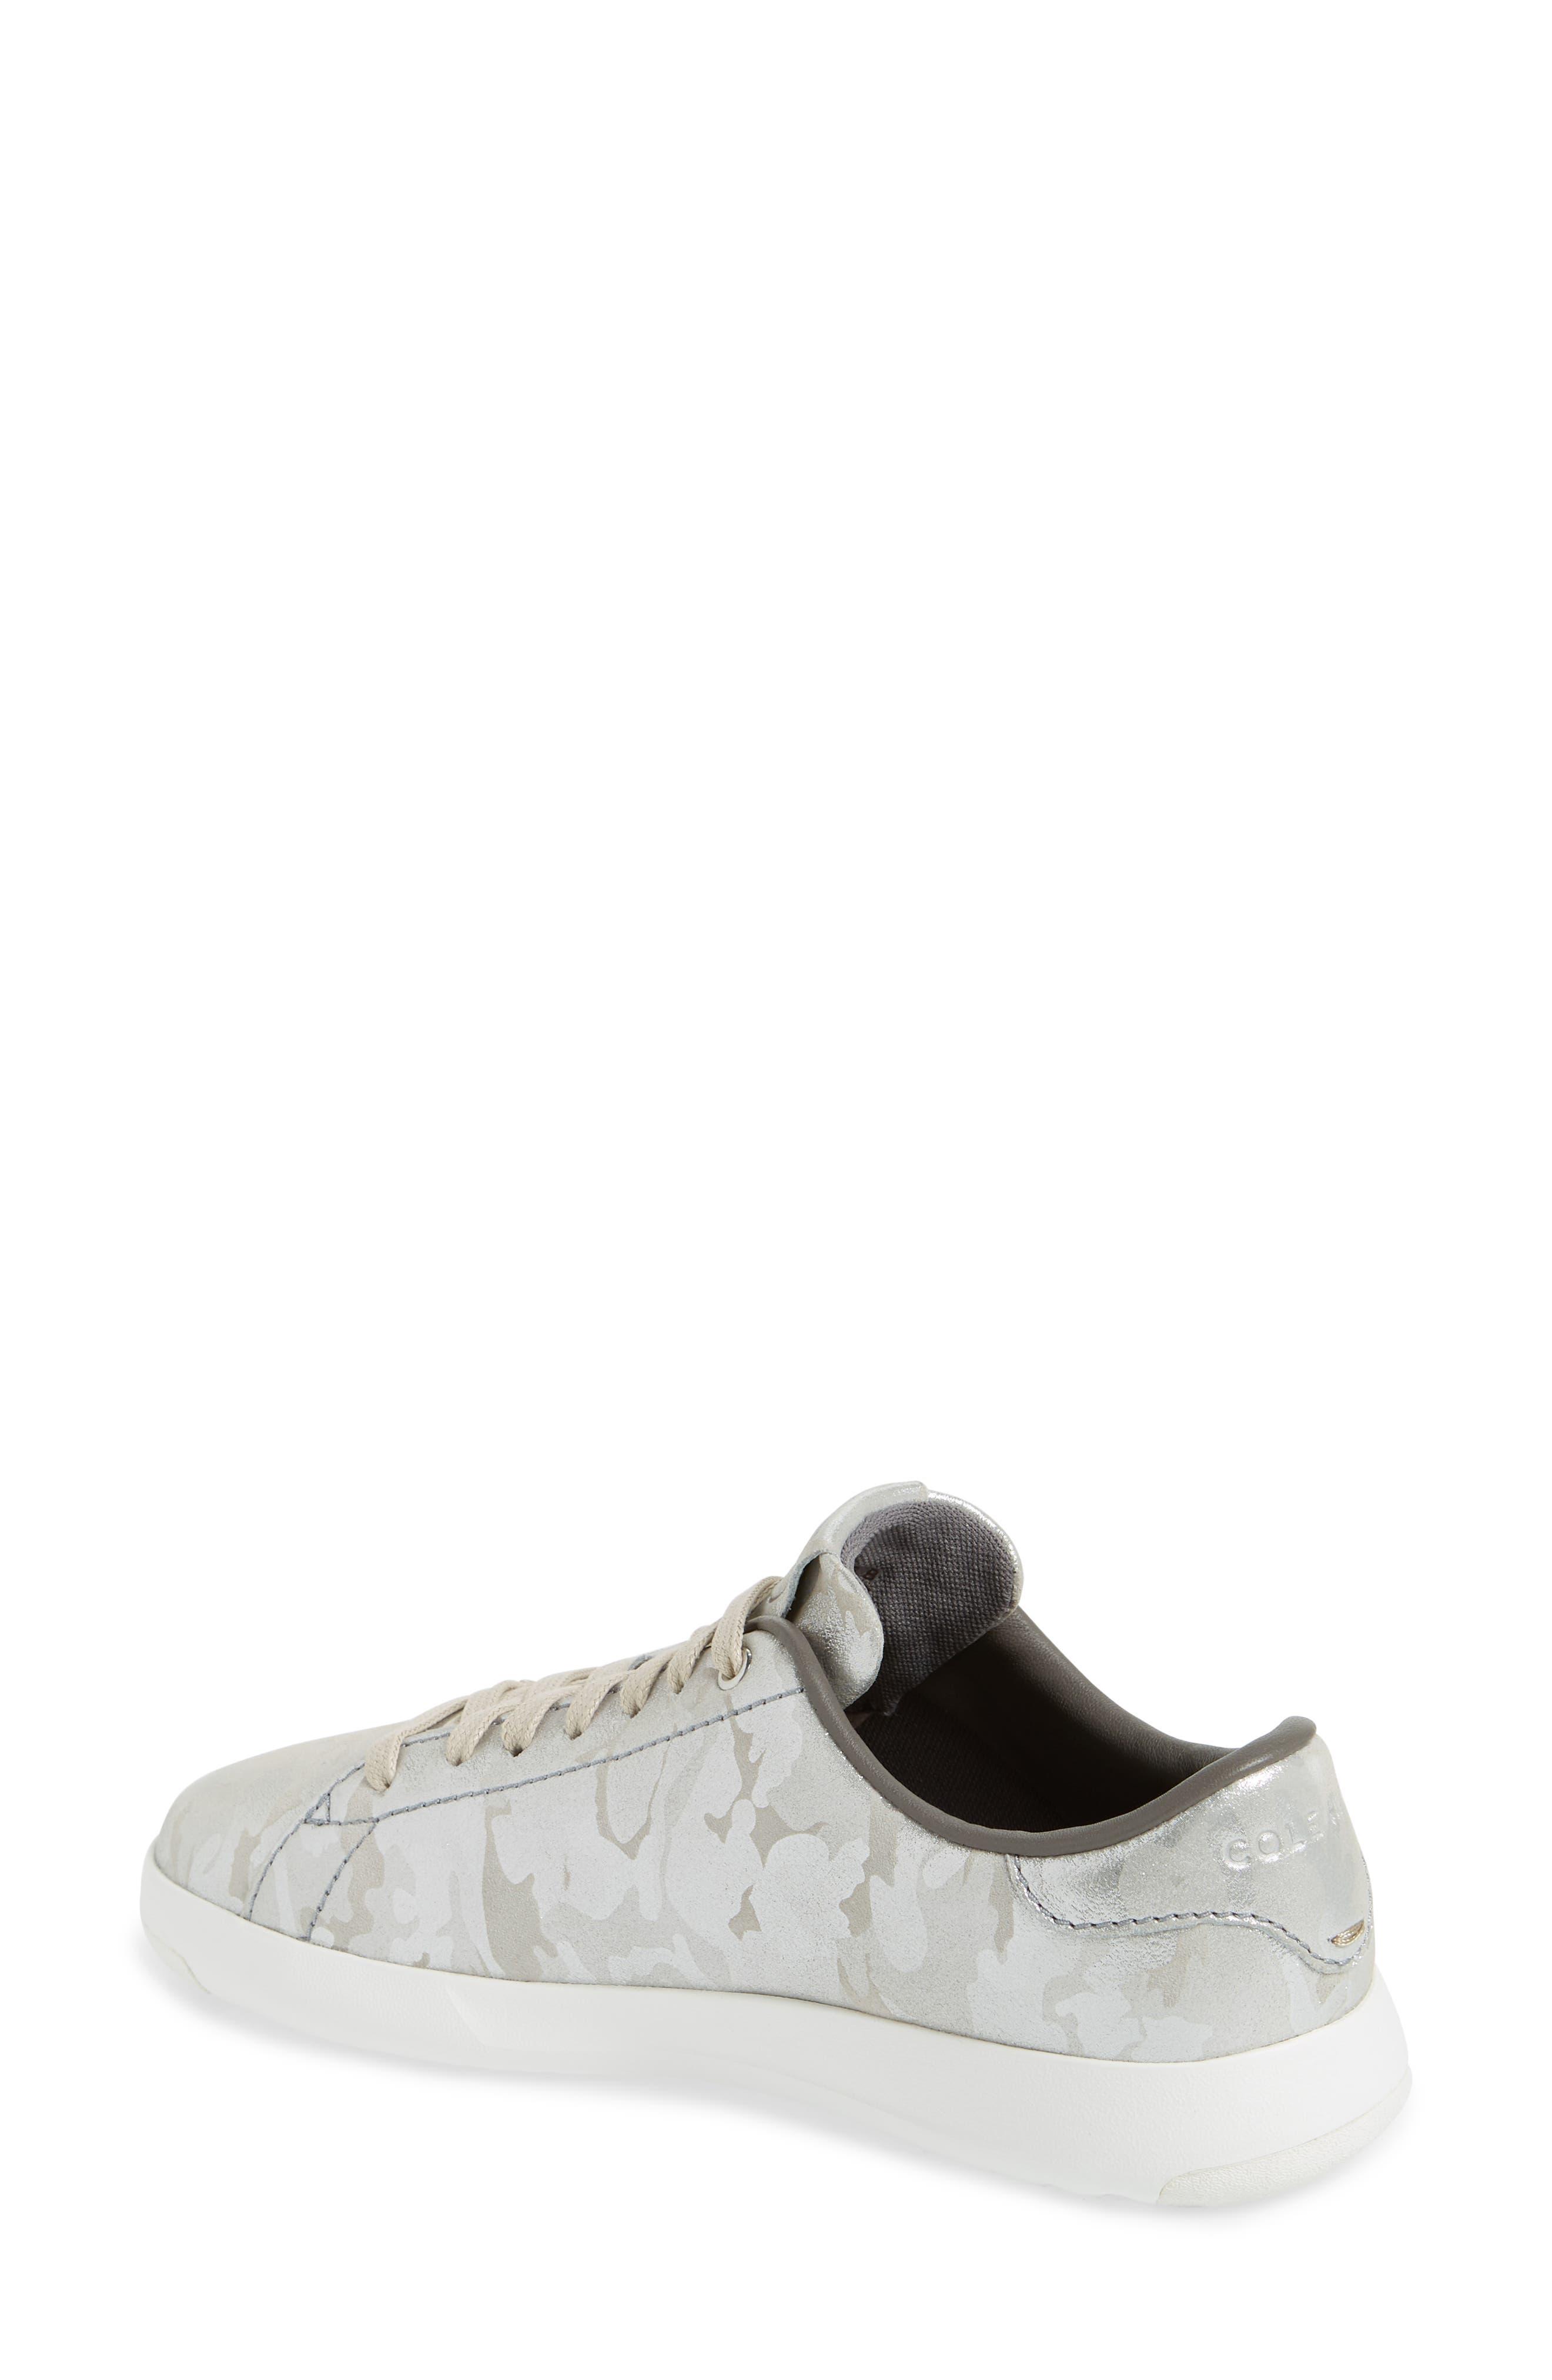 GrandPro Tennis Shoe,                             Alternate thumbnail 2, color,                             Dove Metallic Camo Leather